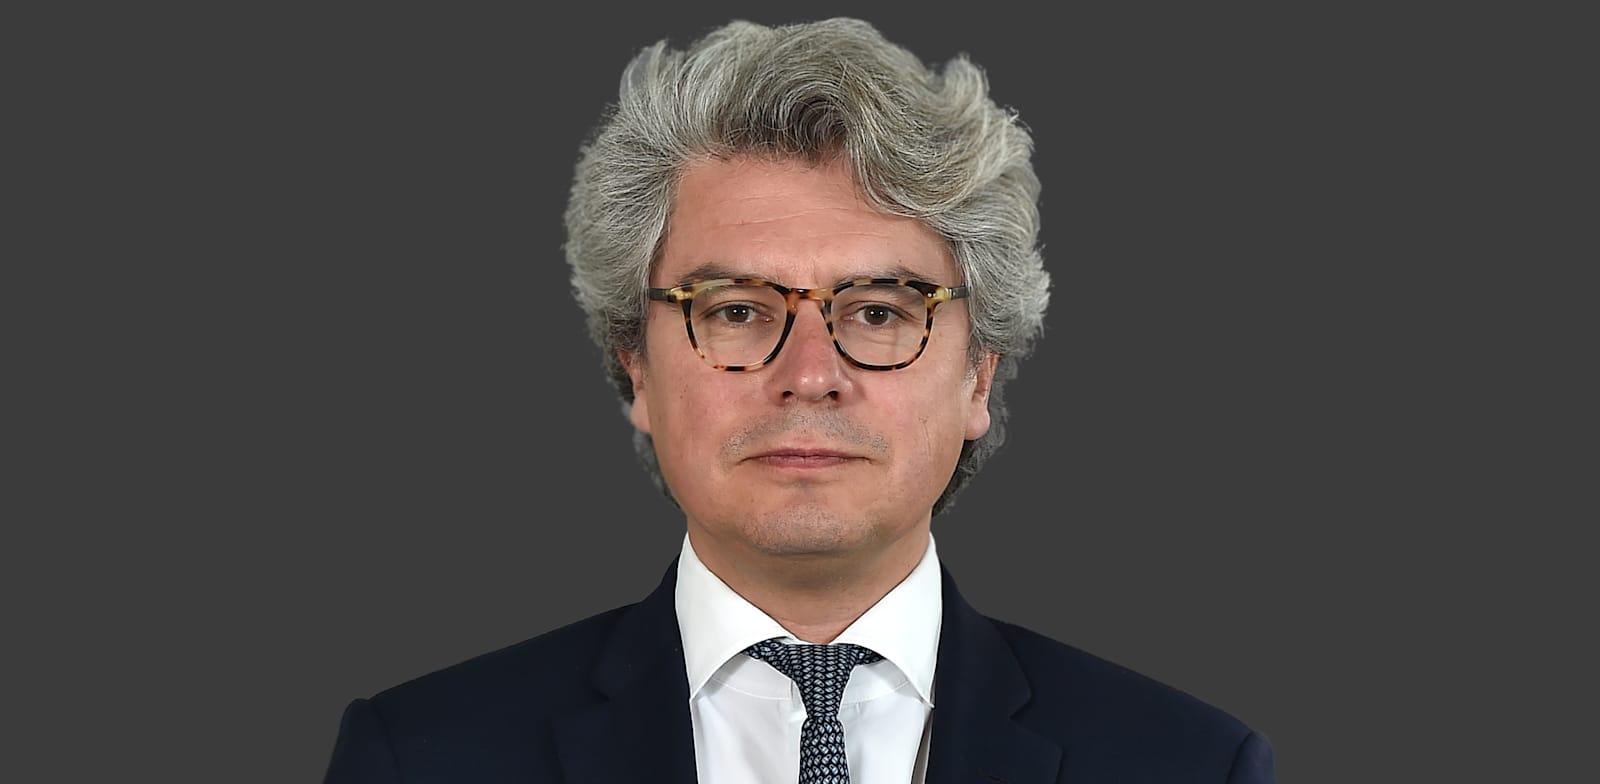 Adv. Christophe Bachelet Credit: DLA Piper